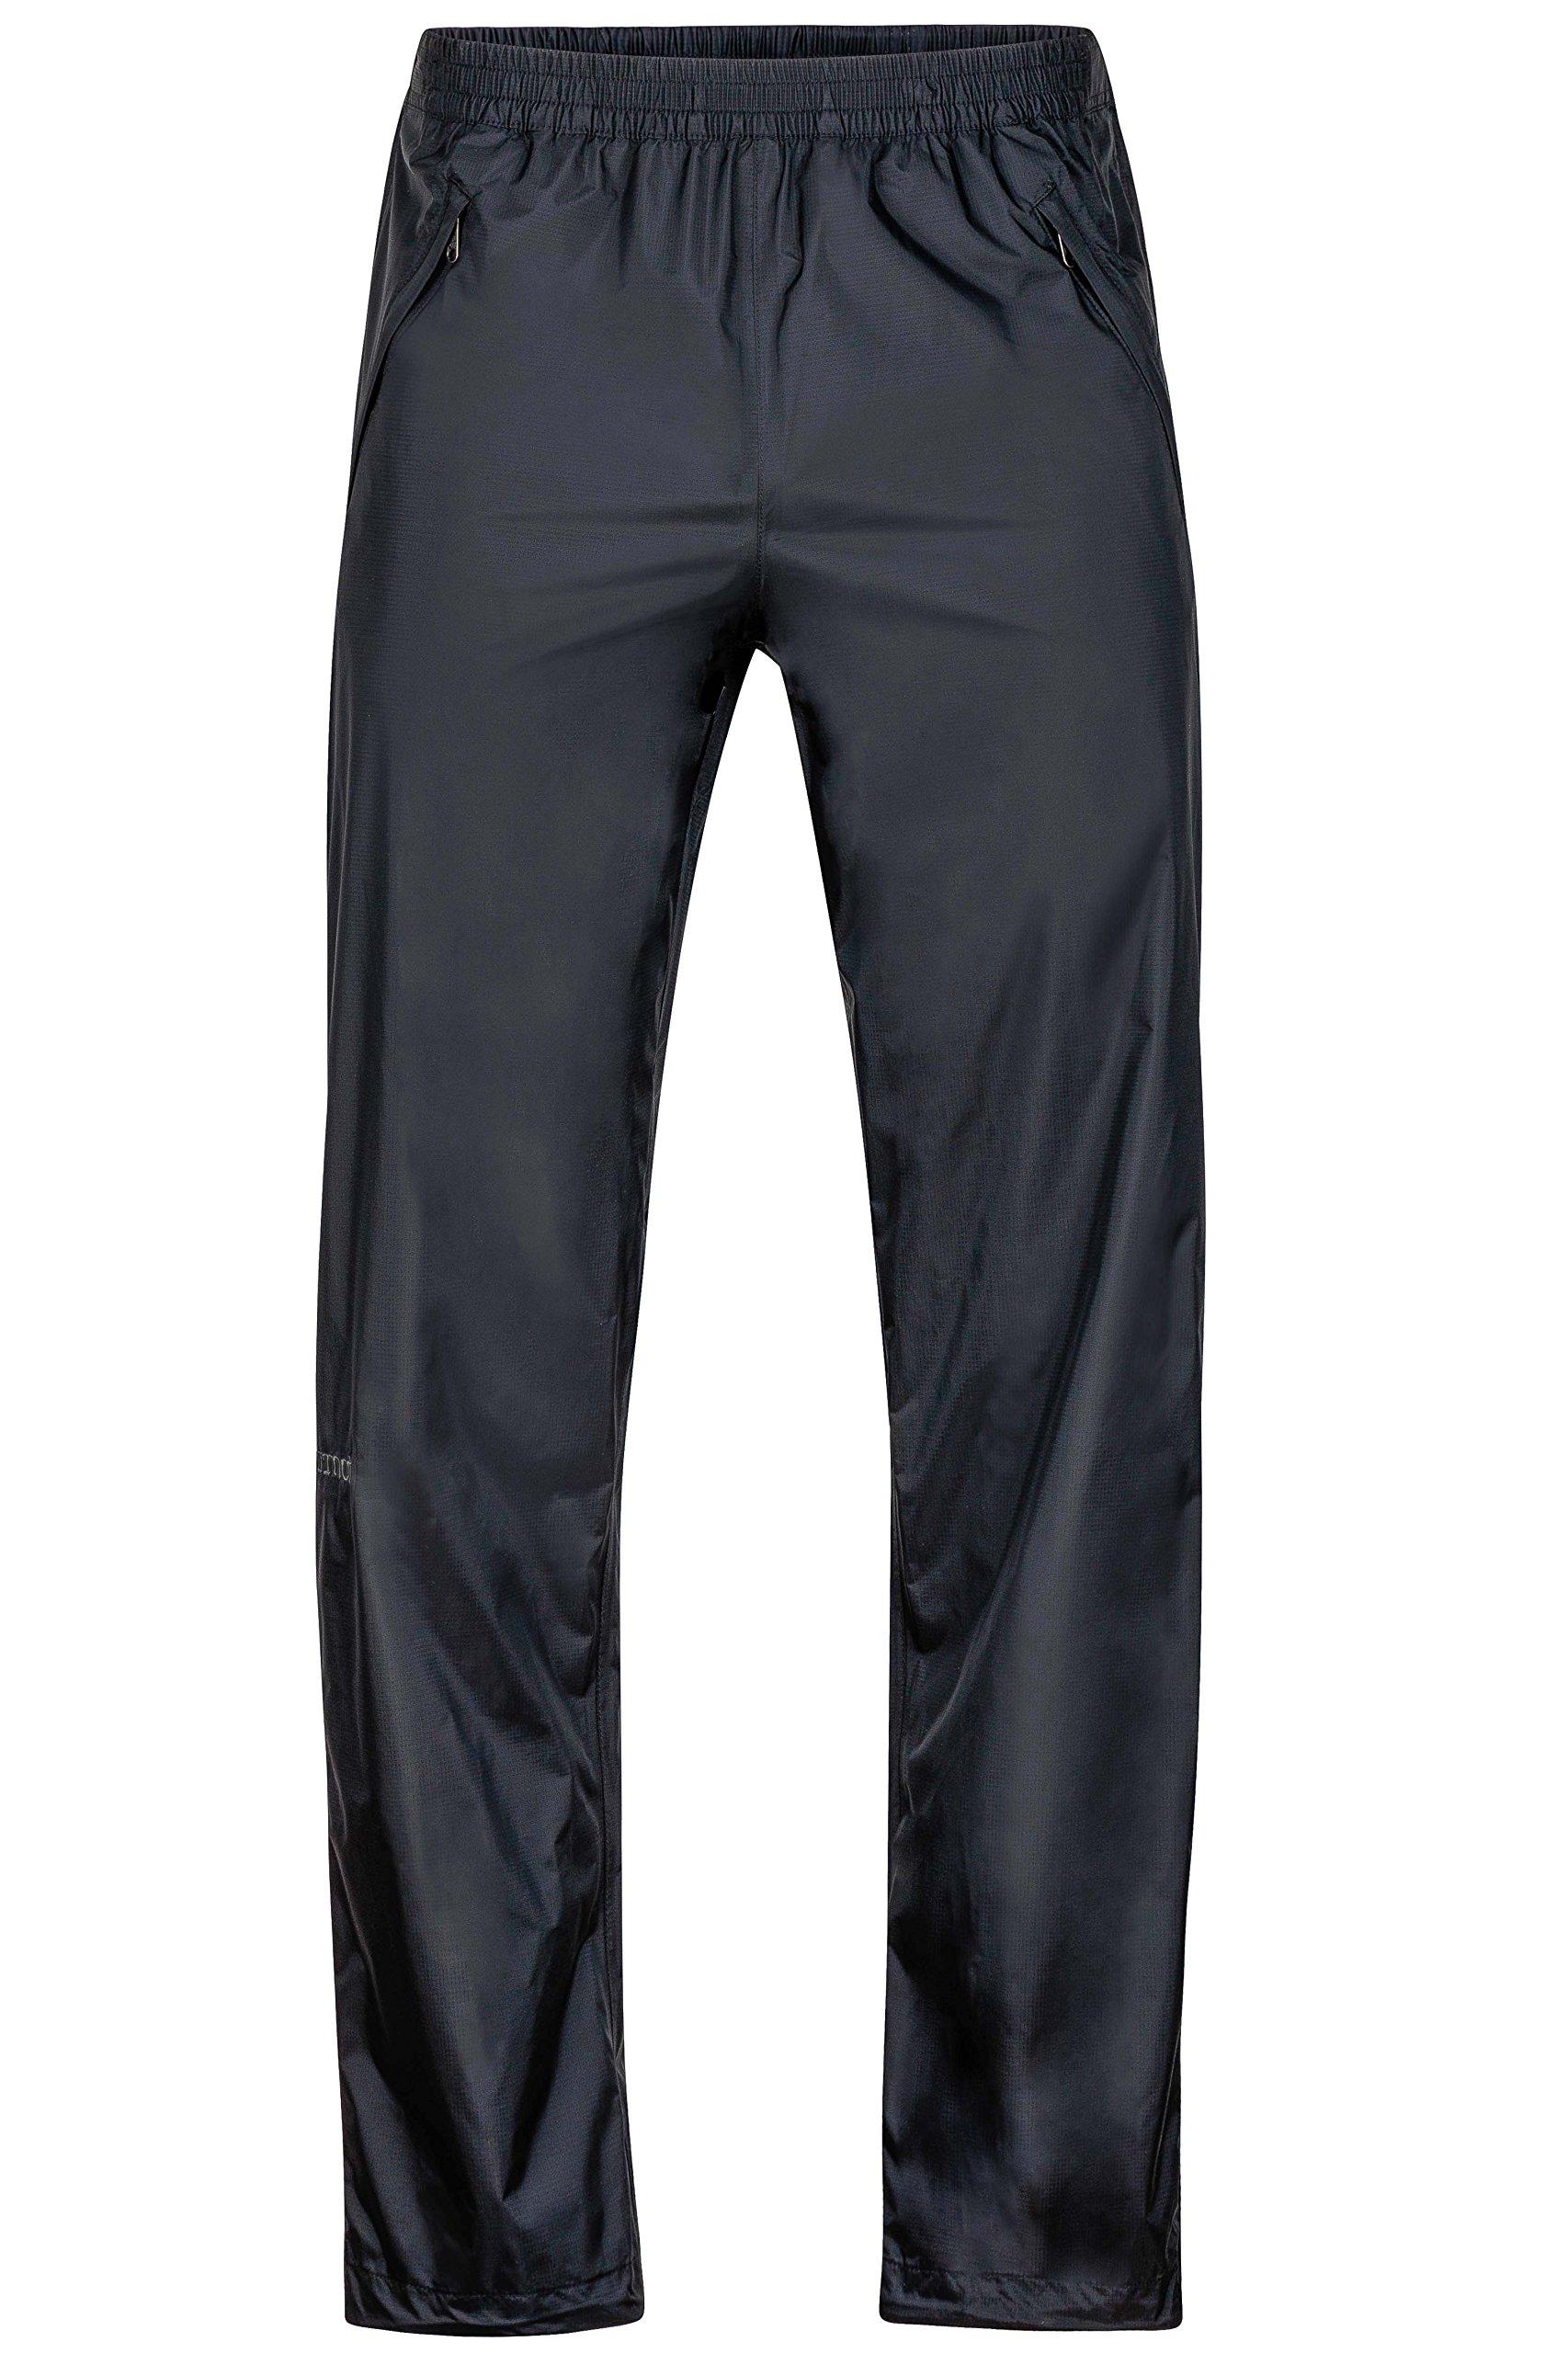 Marmot PreCip Full-Zip Pant - Men's Black, S/Short